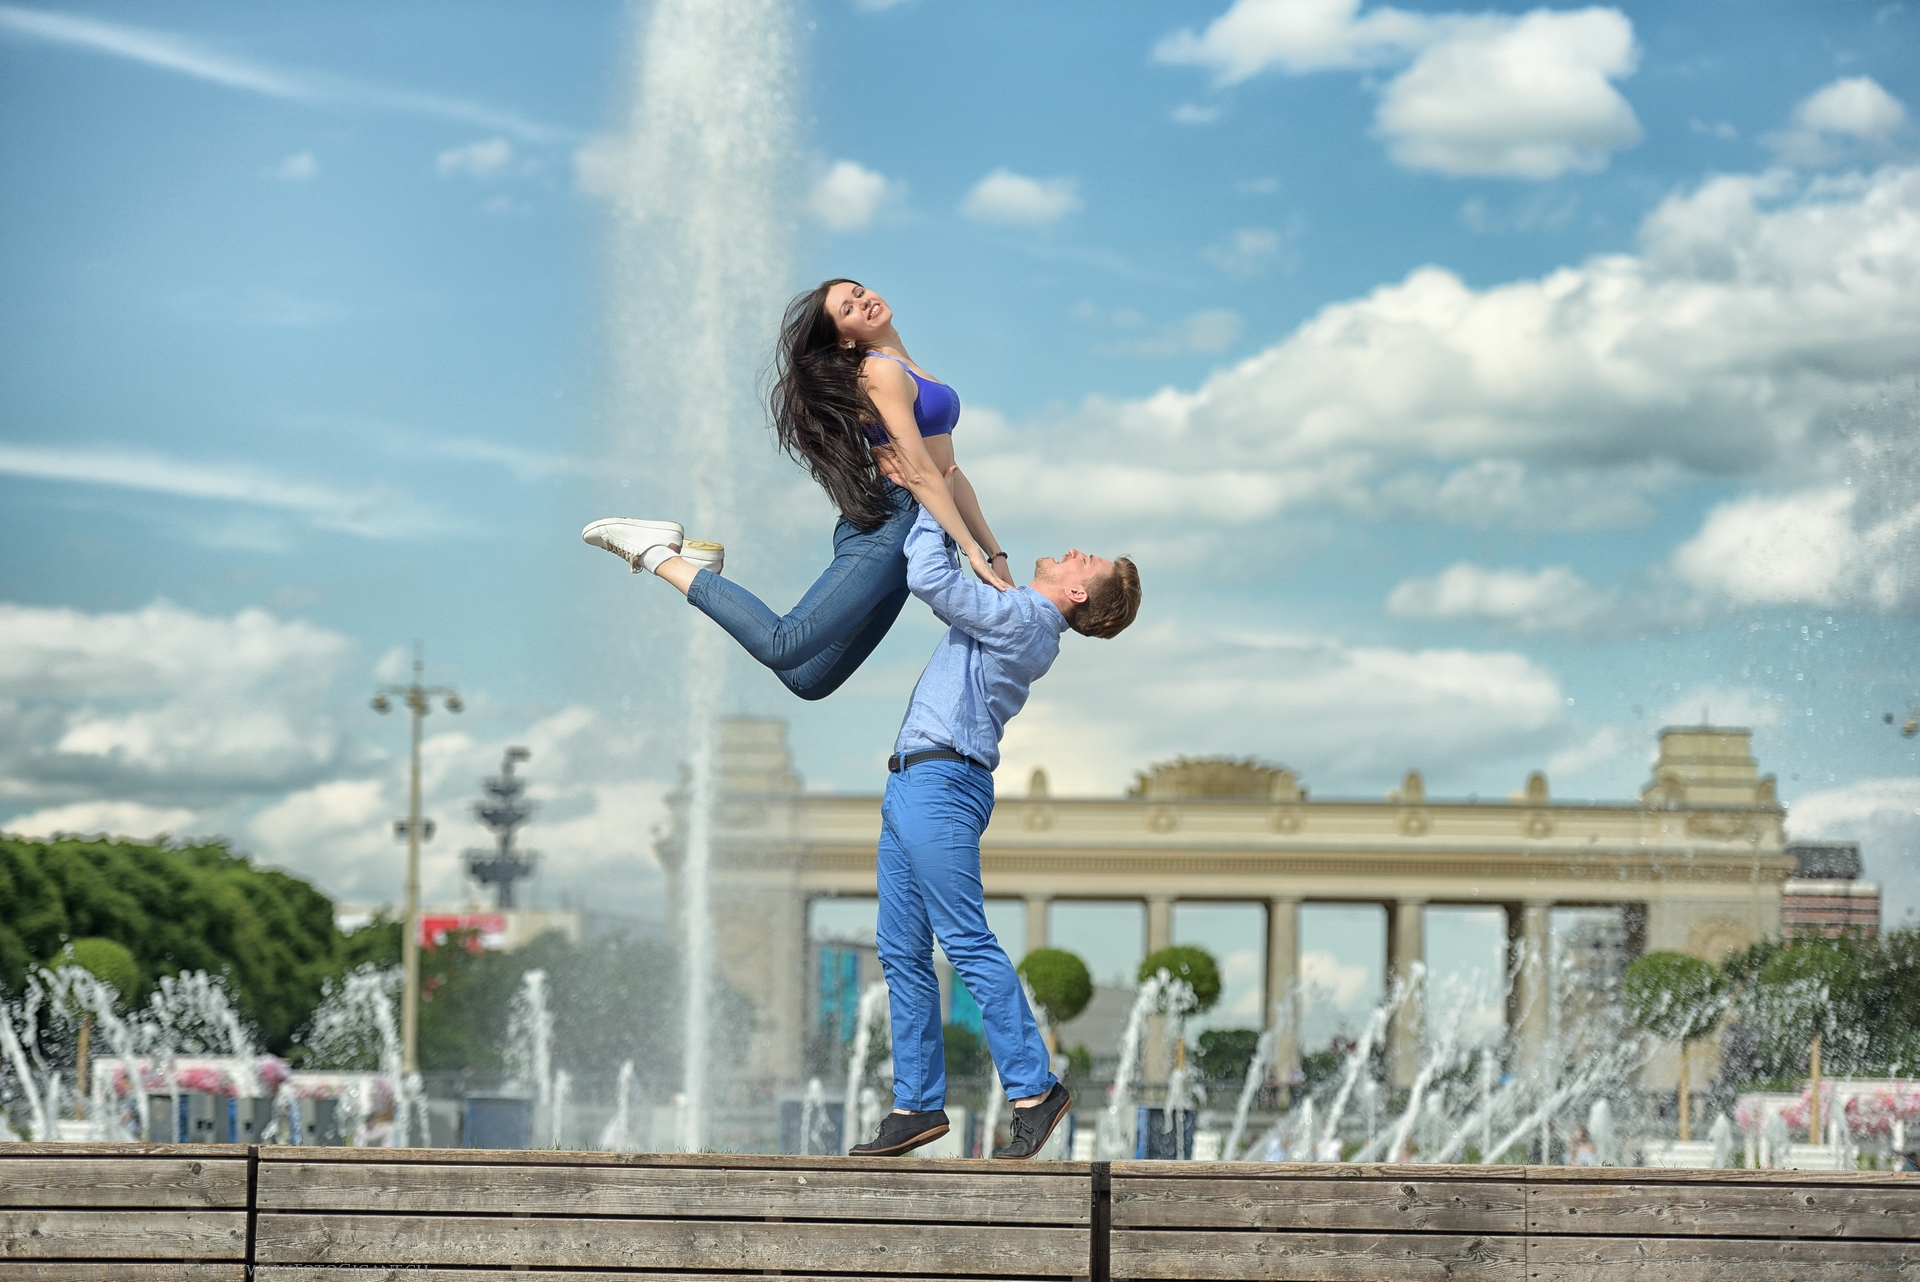 Felix-Peter-Yoga-Pilates-Dance-Fotografie_Bern_152.jpg